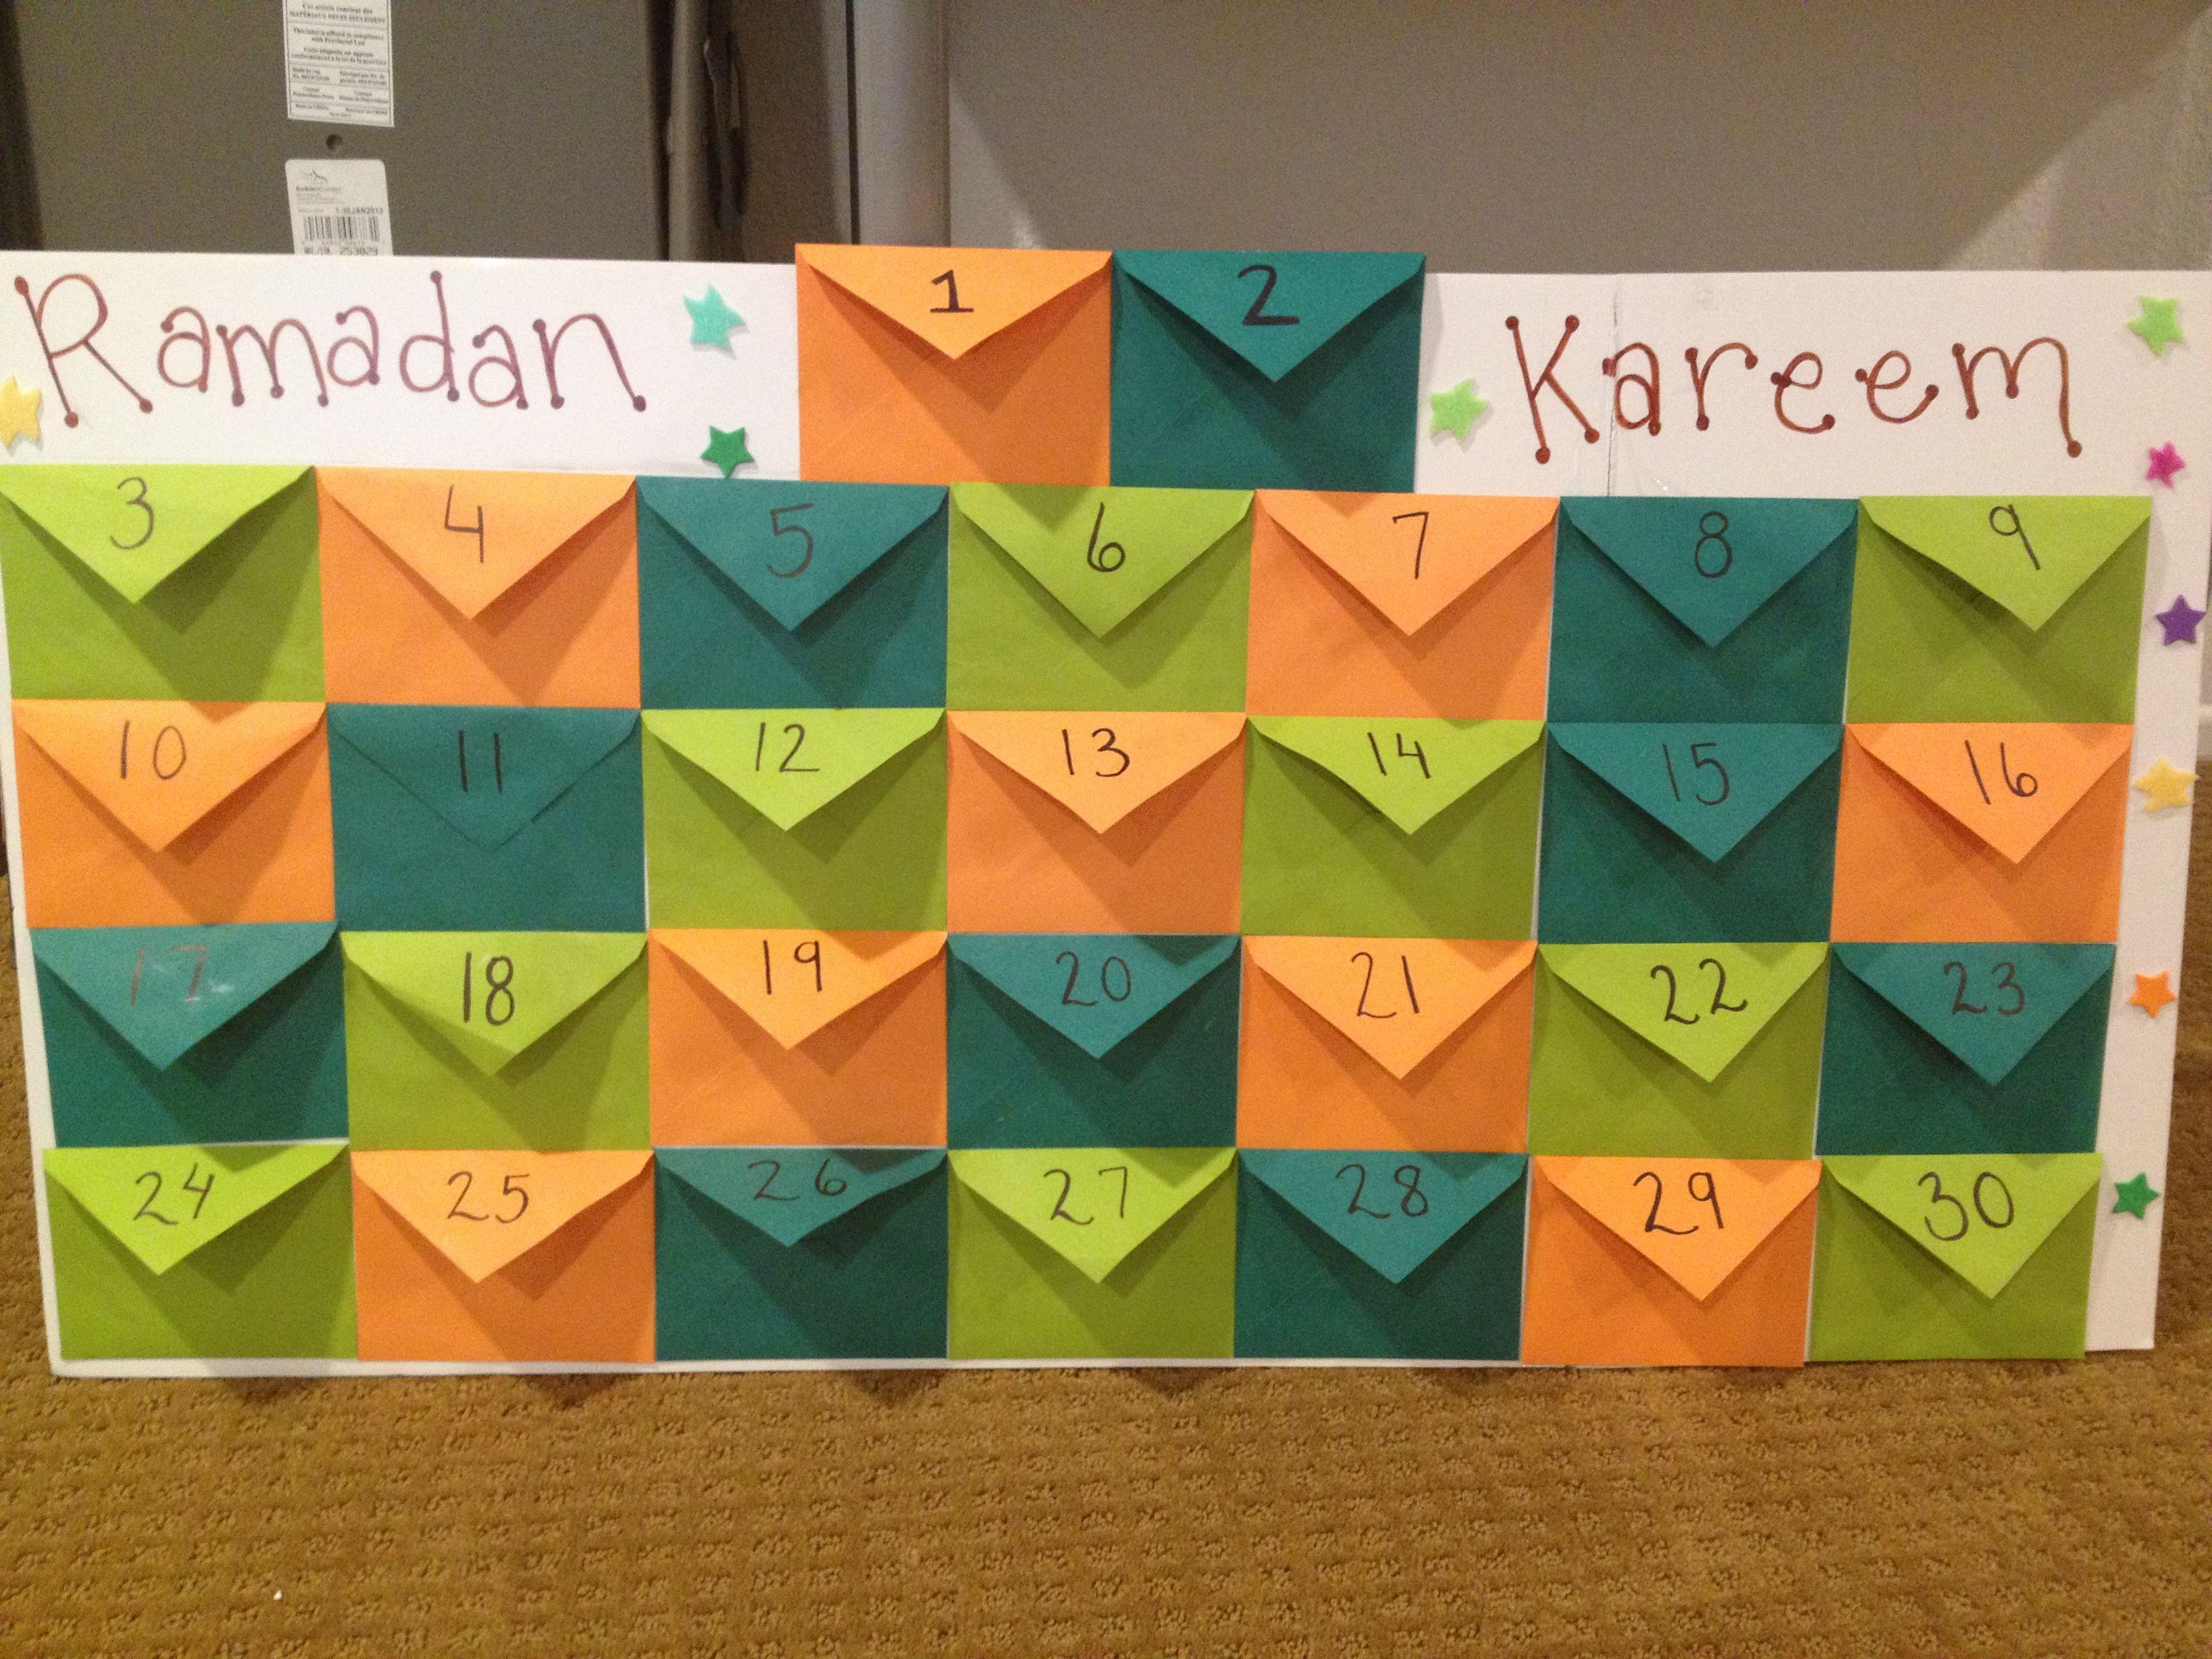 Ramadan Advent Calendar Each Flap Reveals A Hadith To